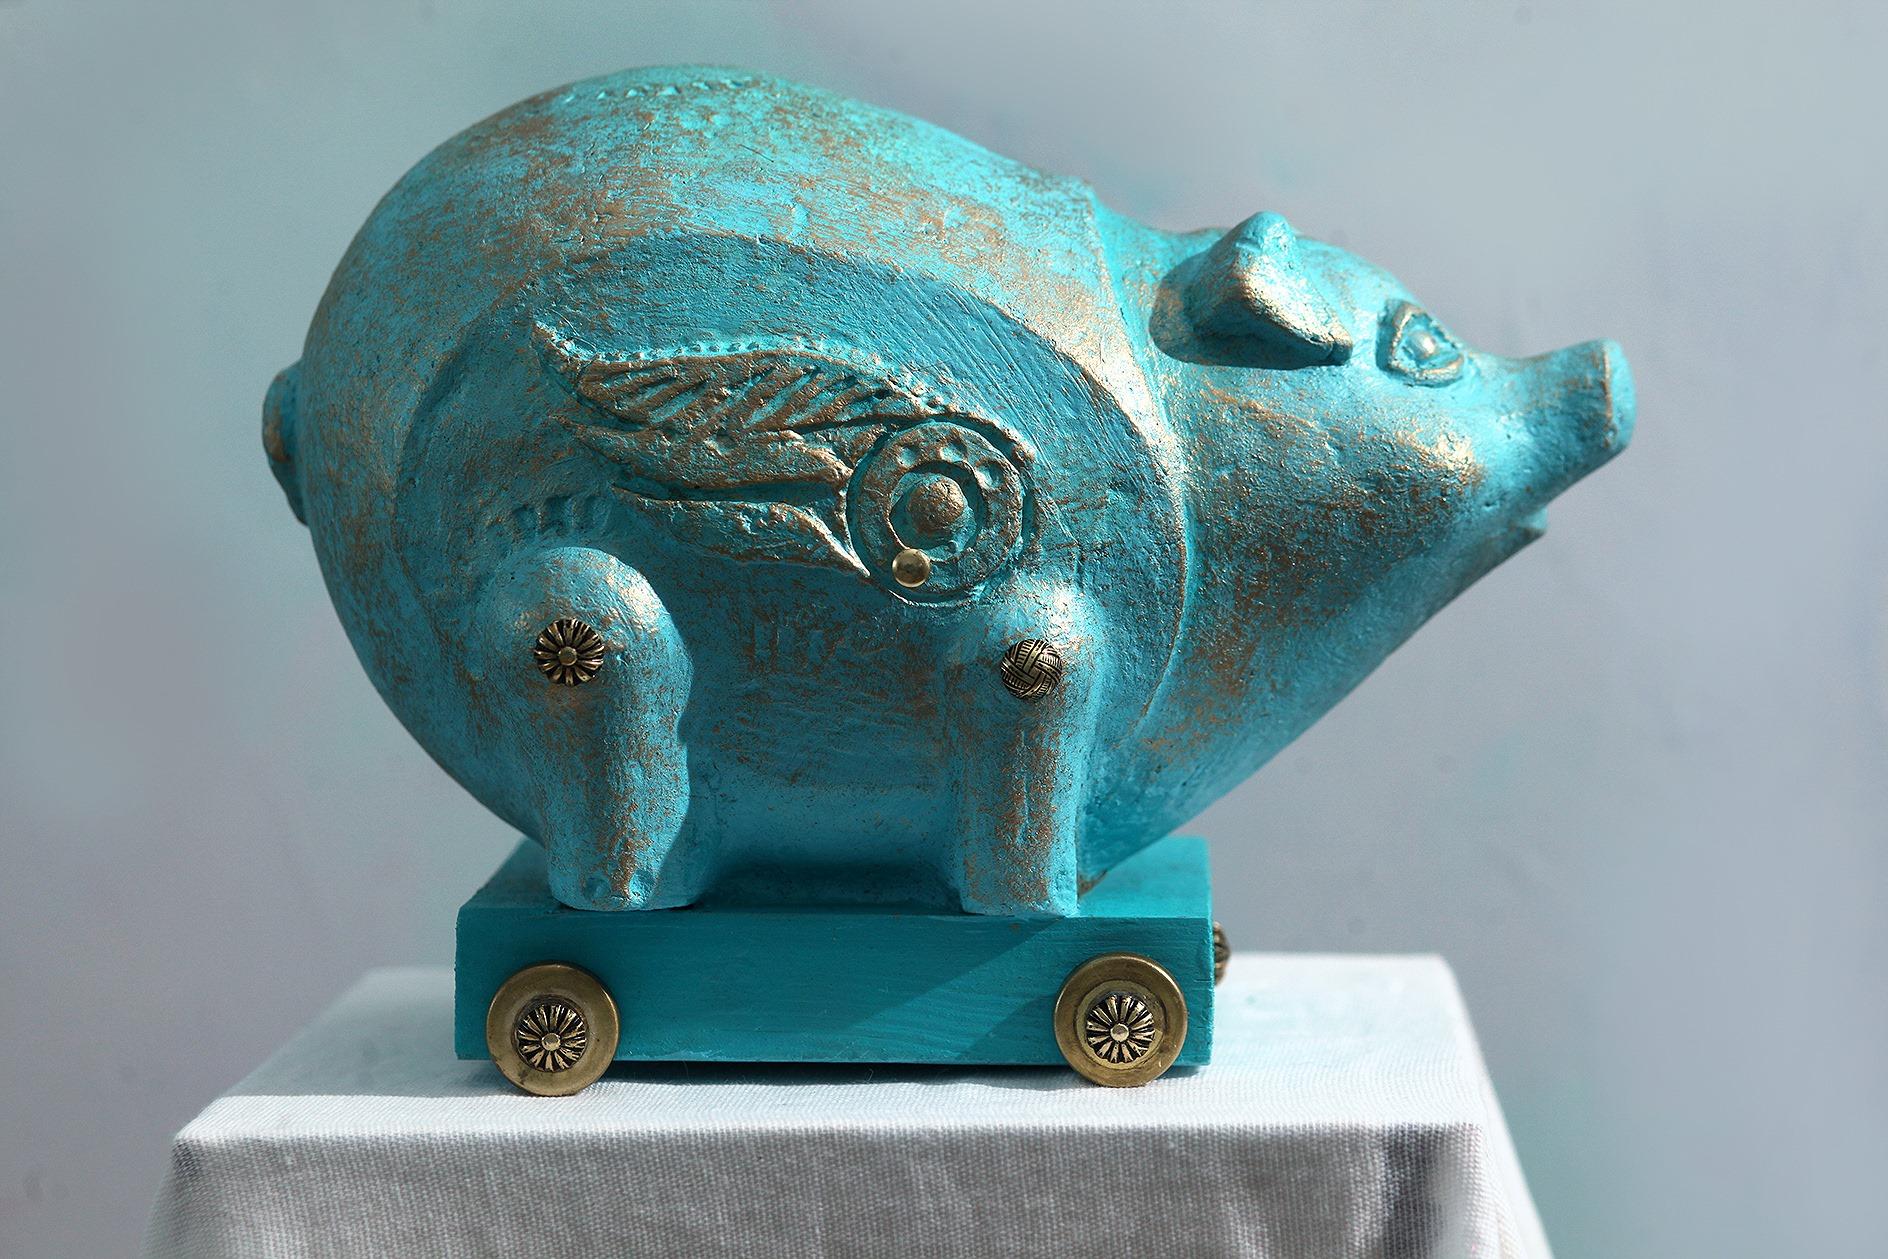 Летучая свинка.       2018 г.         Дерево, металл, папье-маше.      (18х25х13 см.)